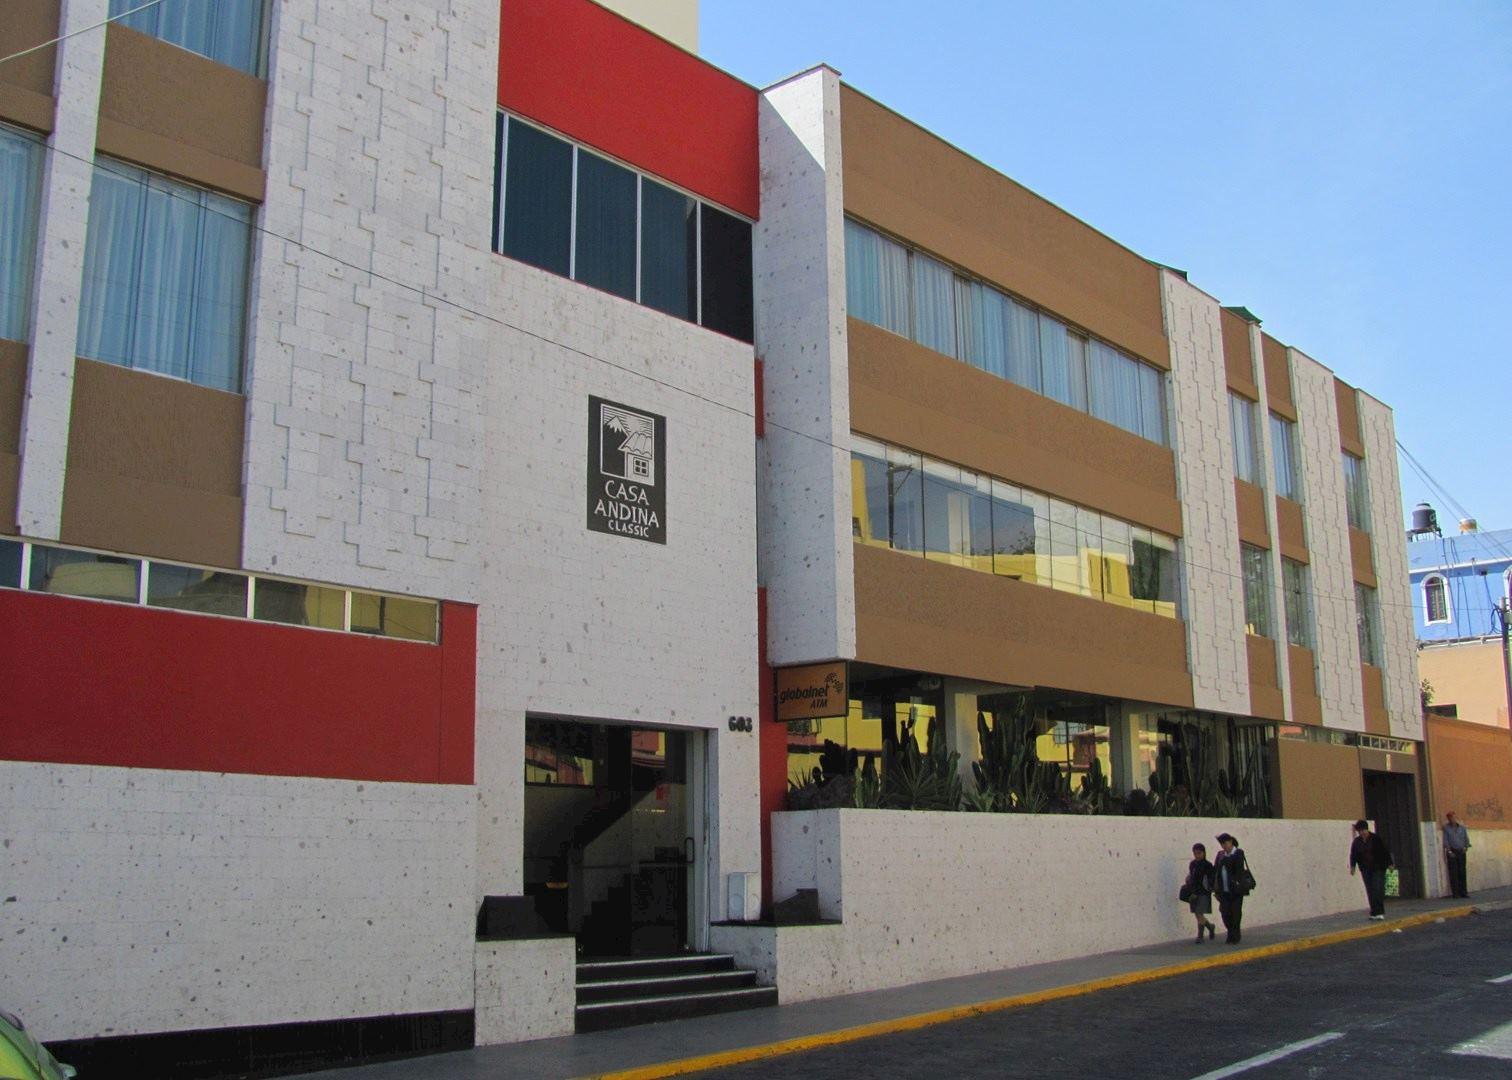 Casa andina classic arequipa arequipa audley travel for Casa andina classic arequipa